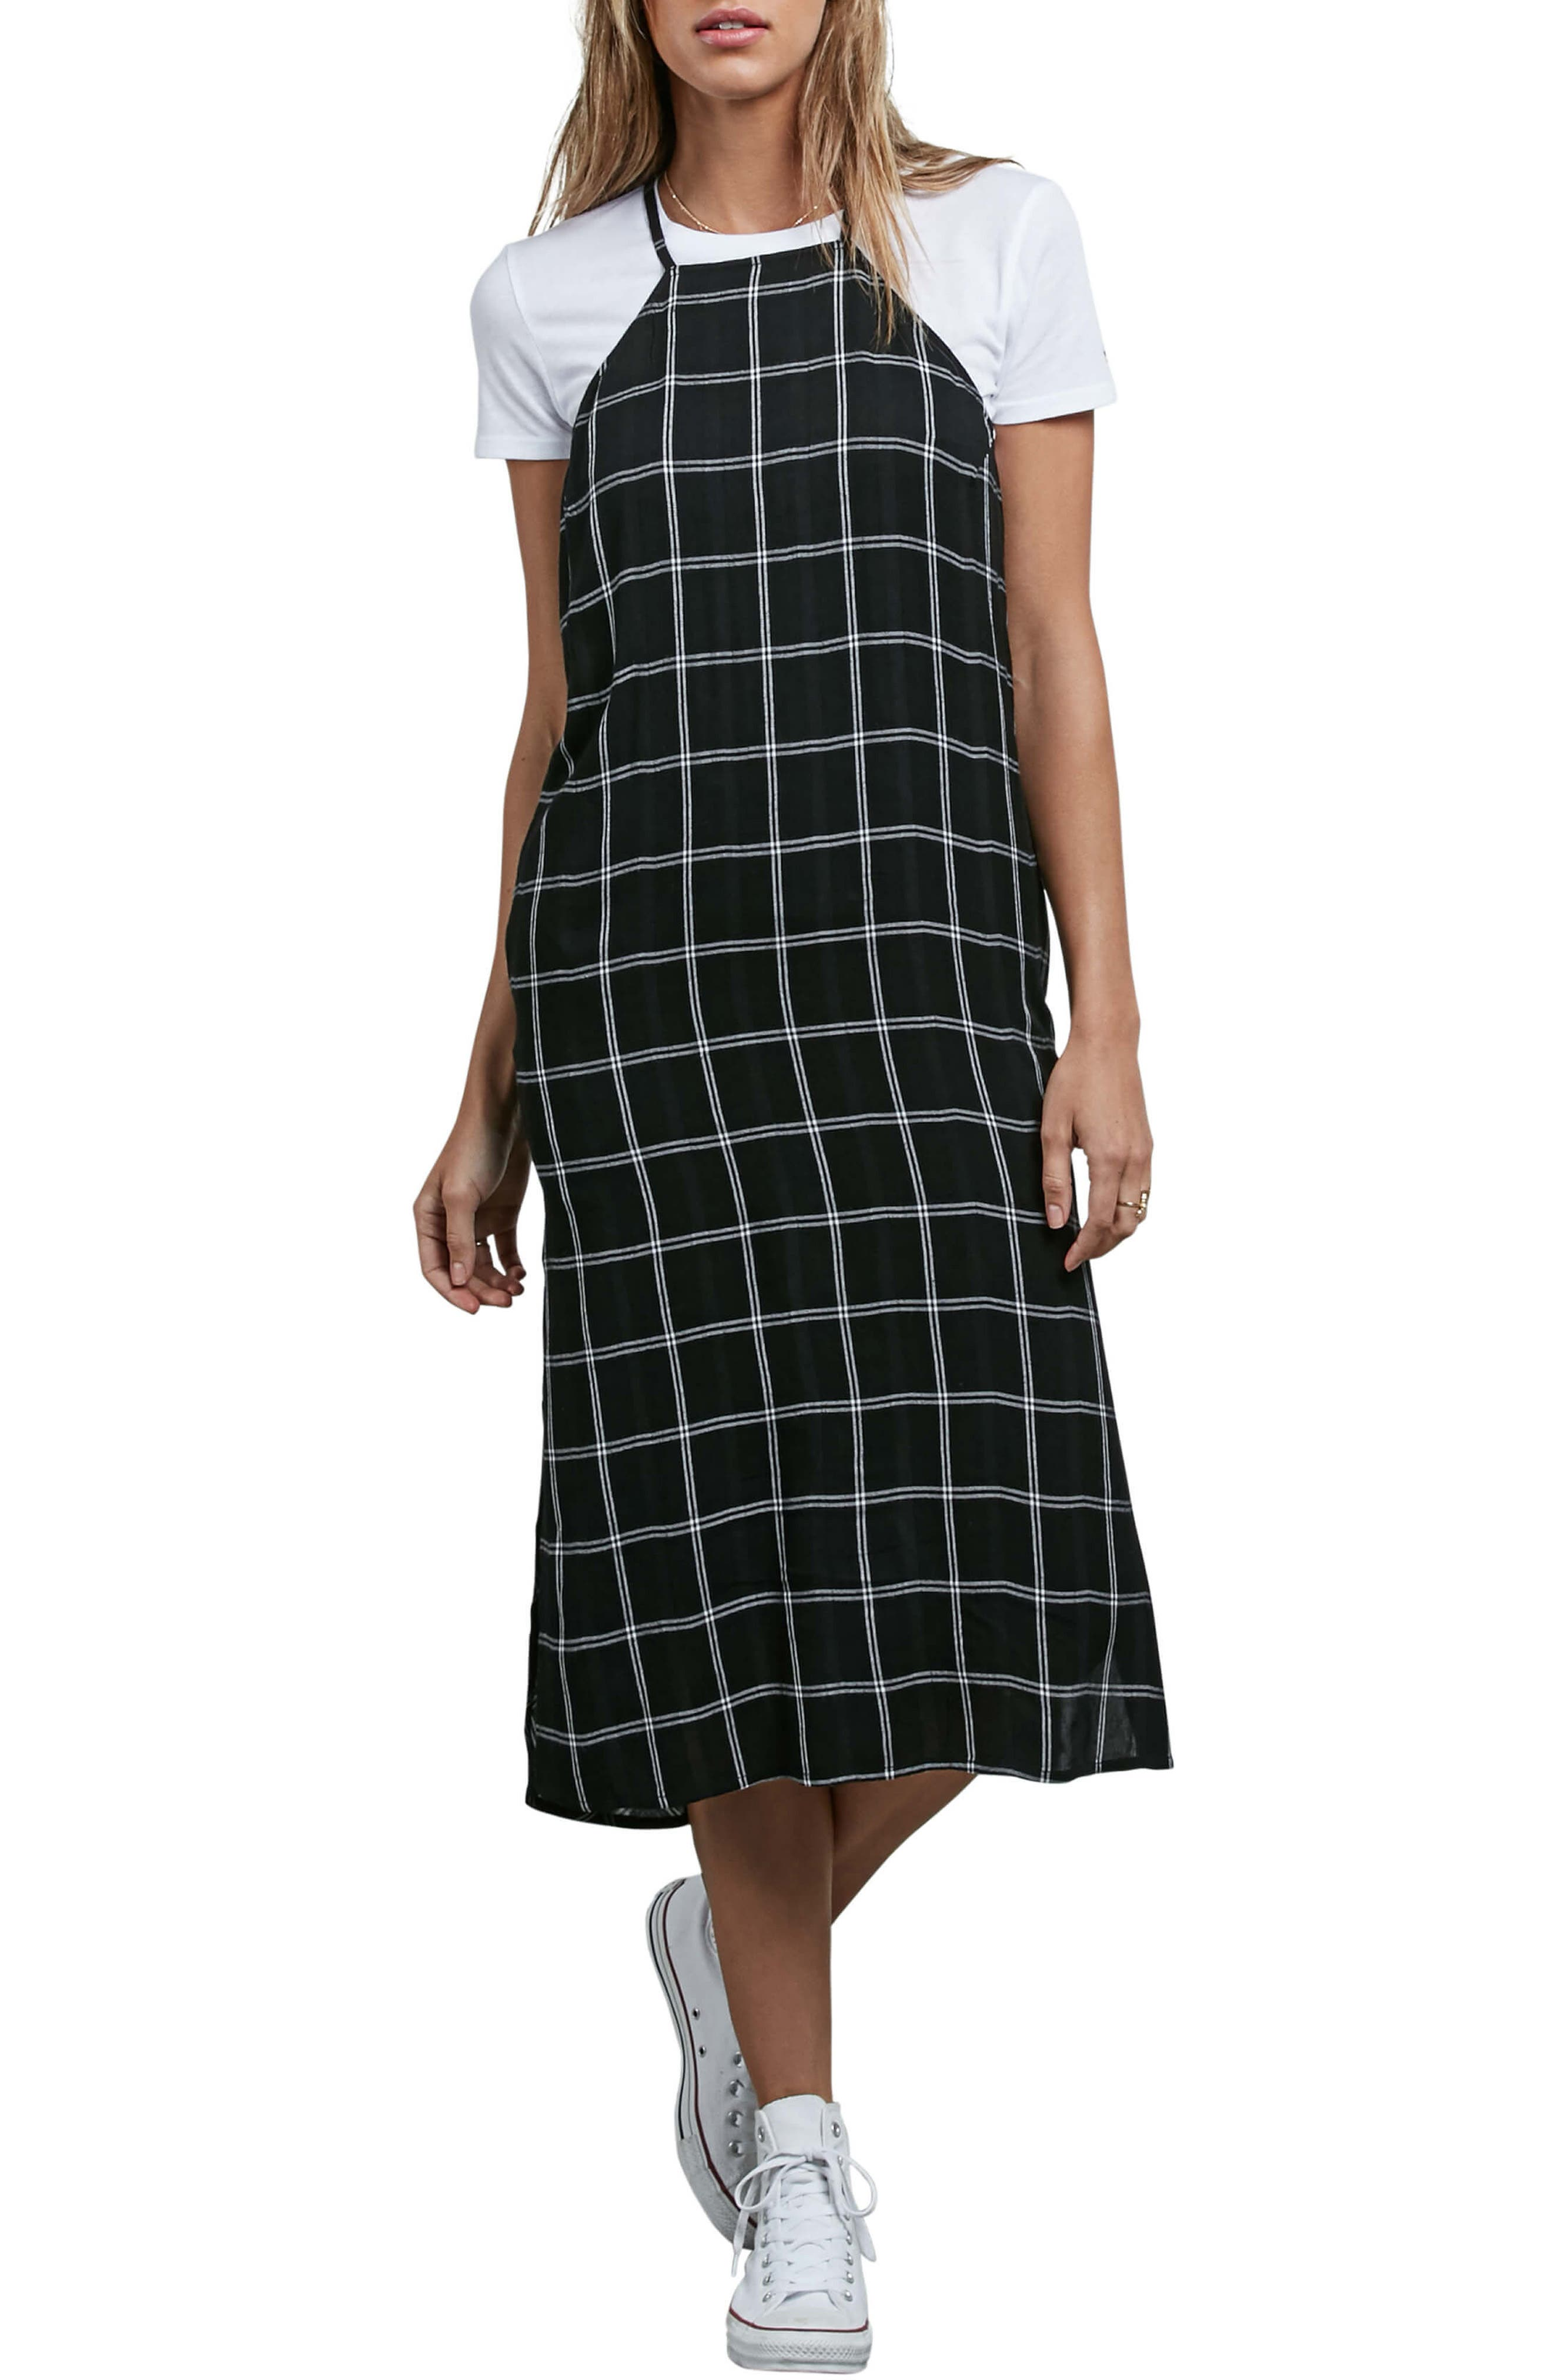 Jumponit Windowpane Print Midi Dress,                             Main thumbnail 1, color,                             Black